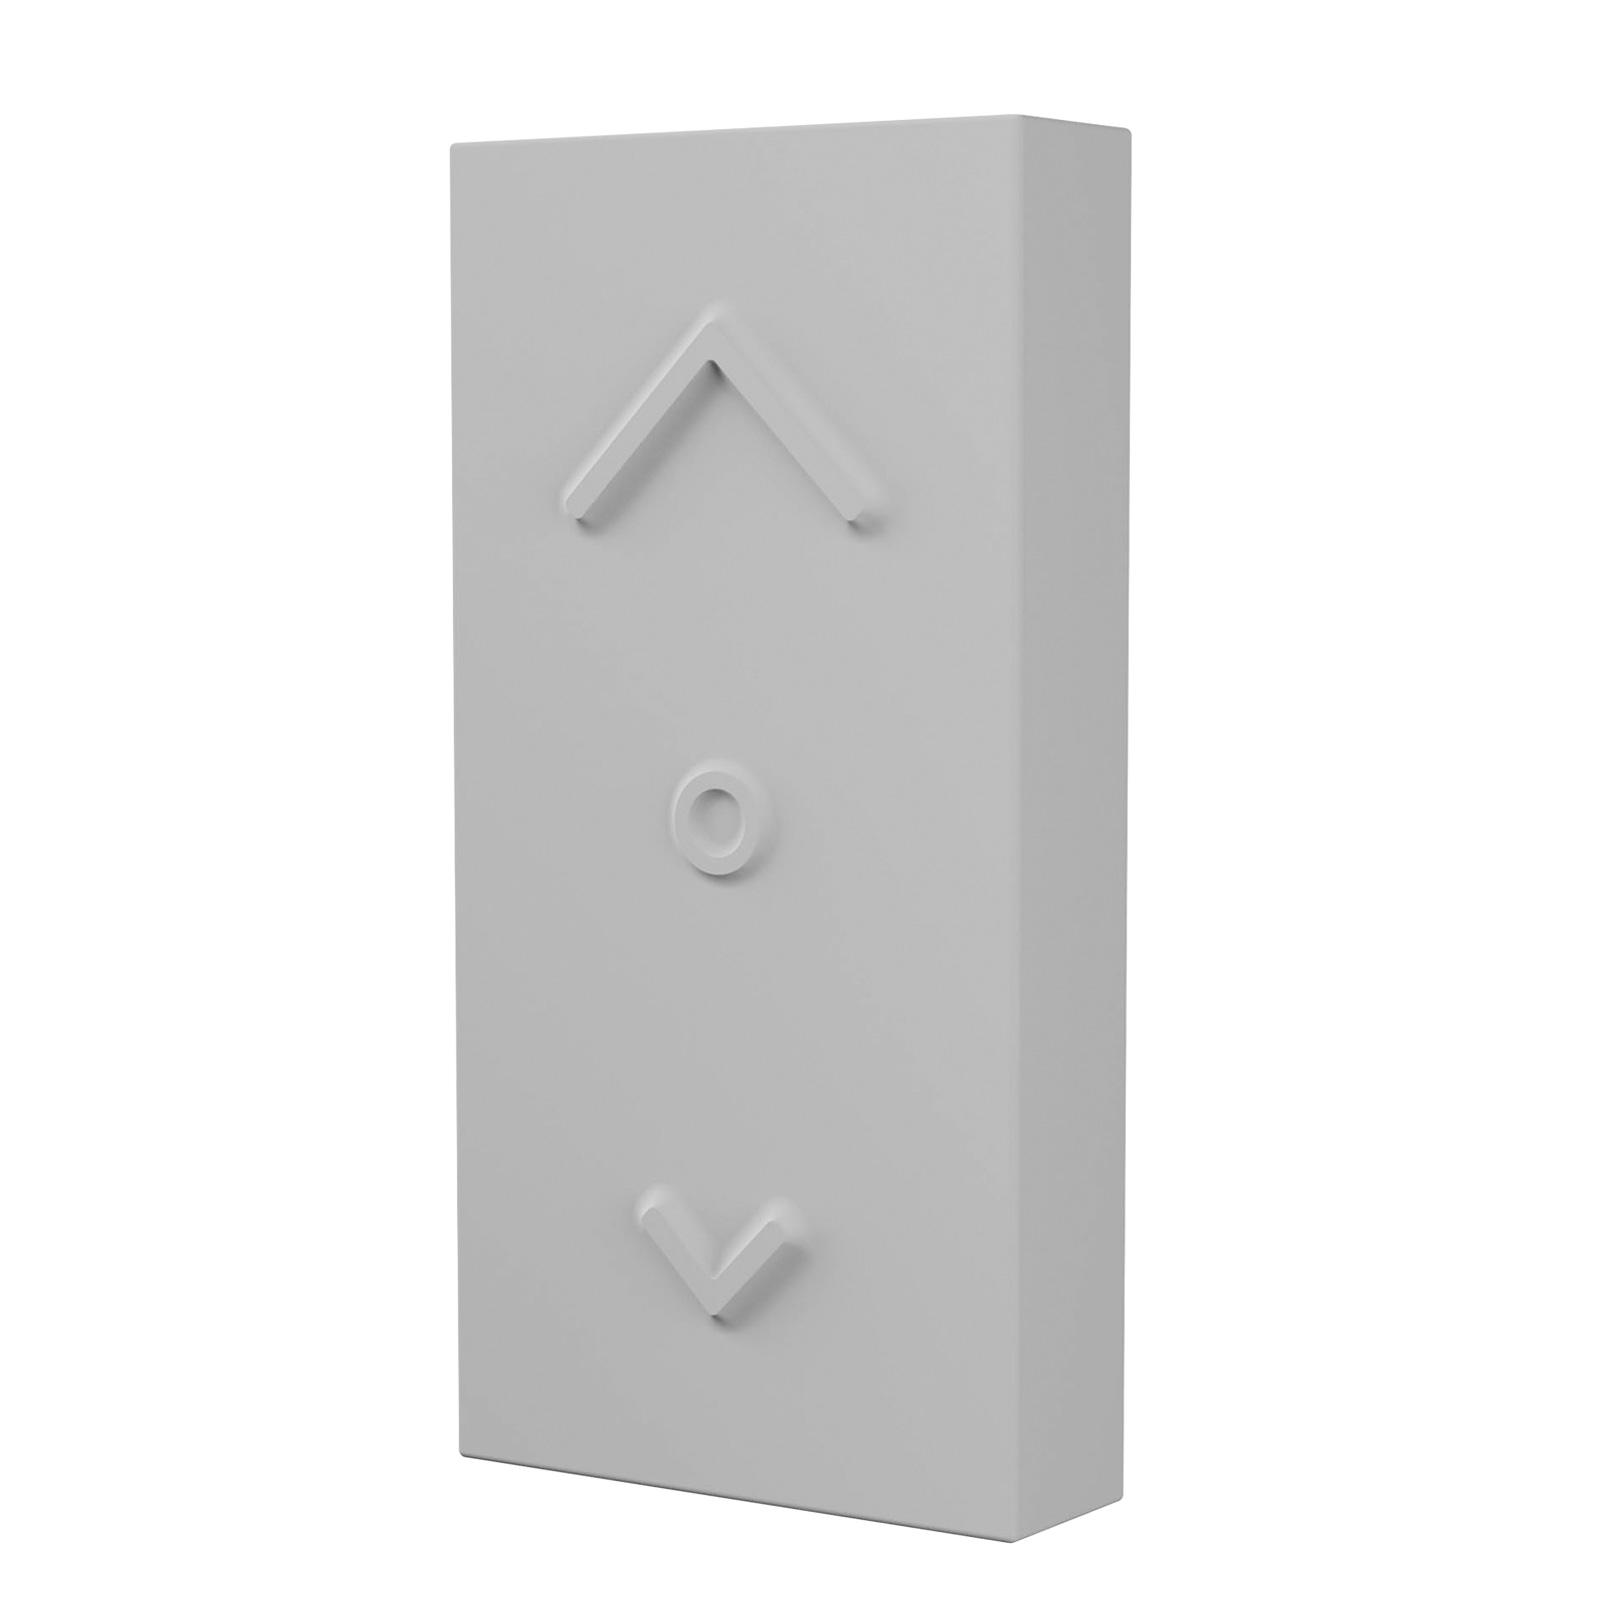 LEDVANCE SMART+ ZigBee Switch Mini grijs